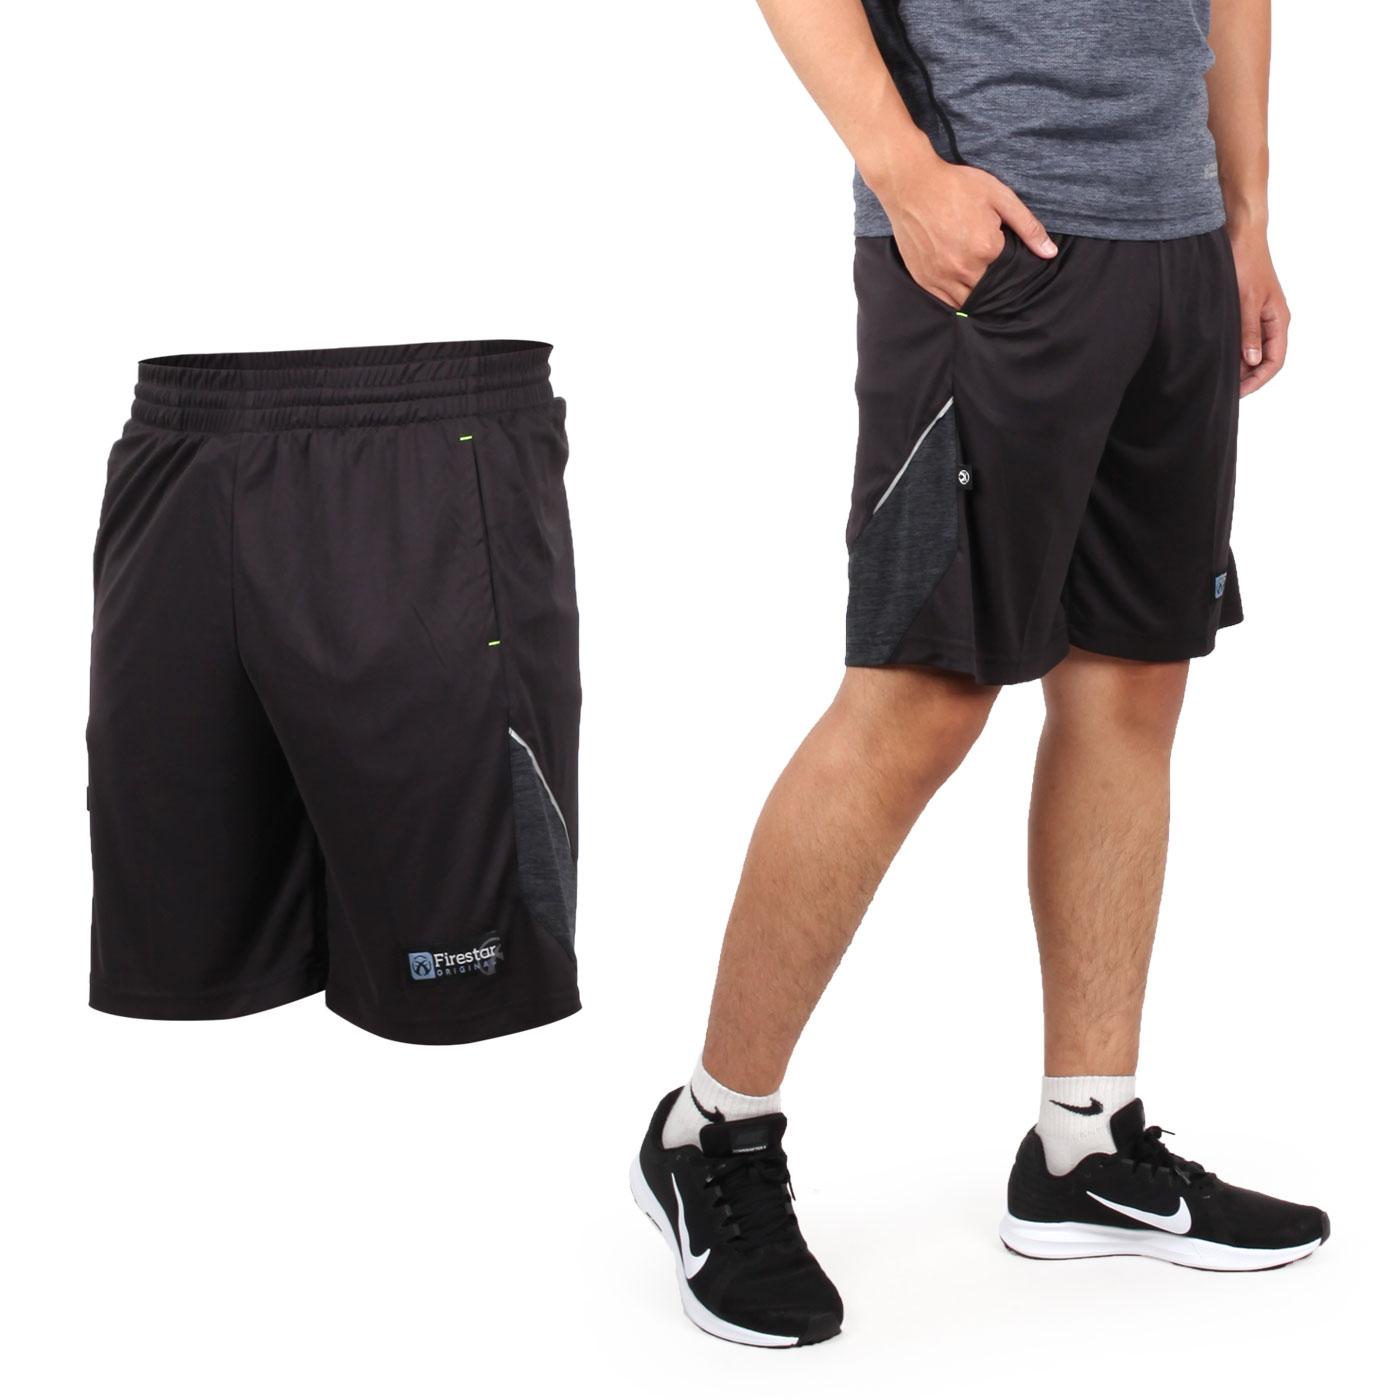 FIRESTAR 男針織籃球短褲 B8003-18 - 黑